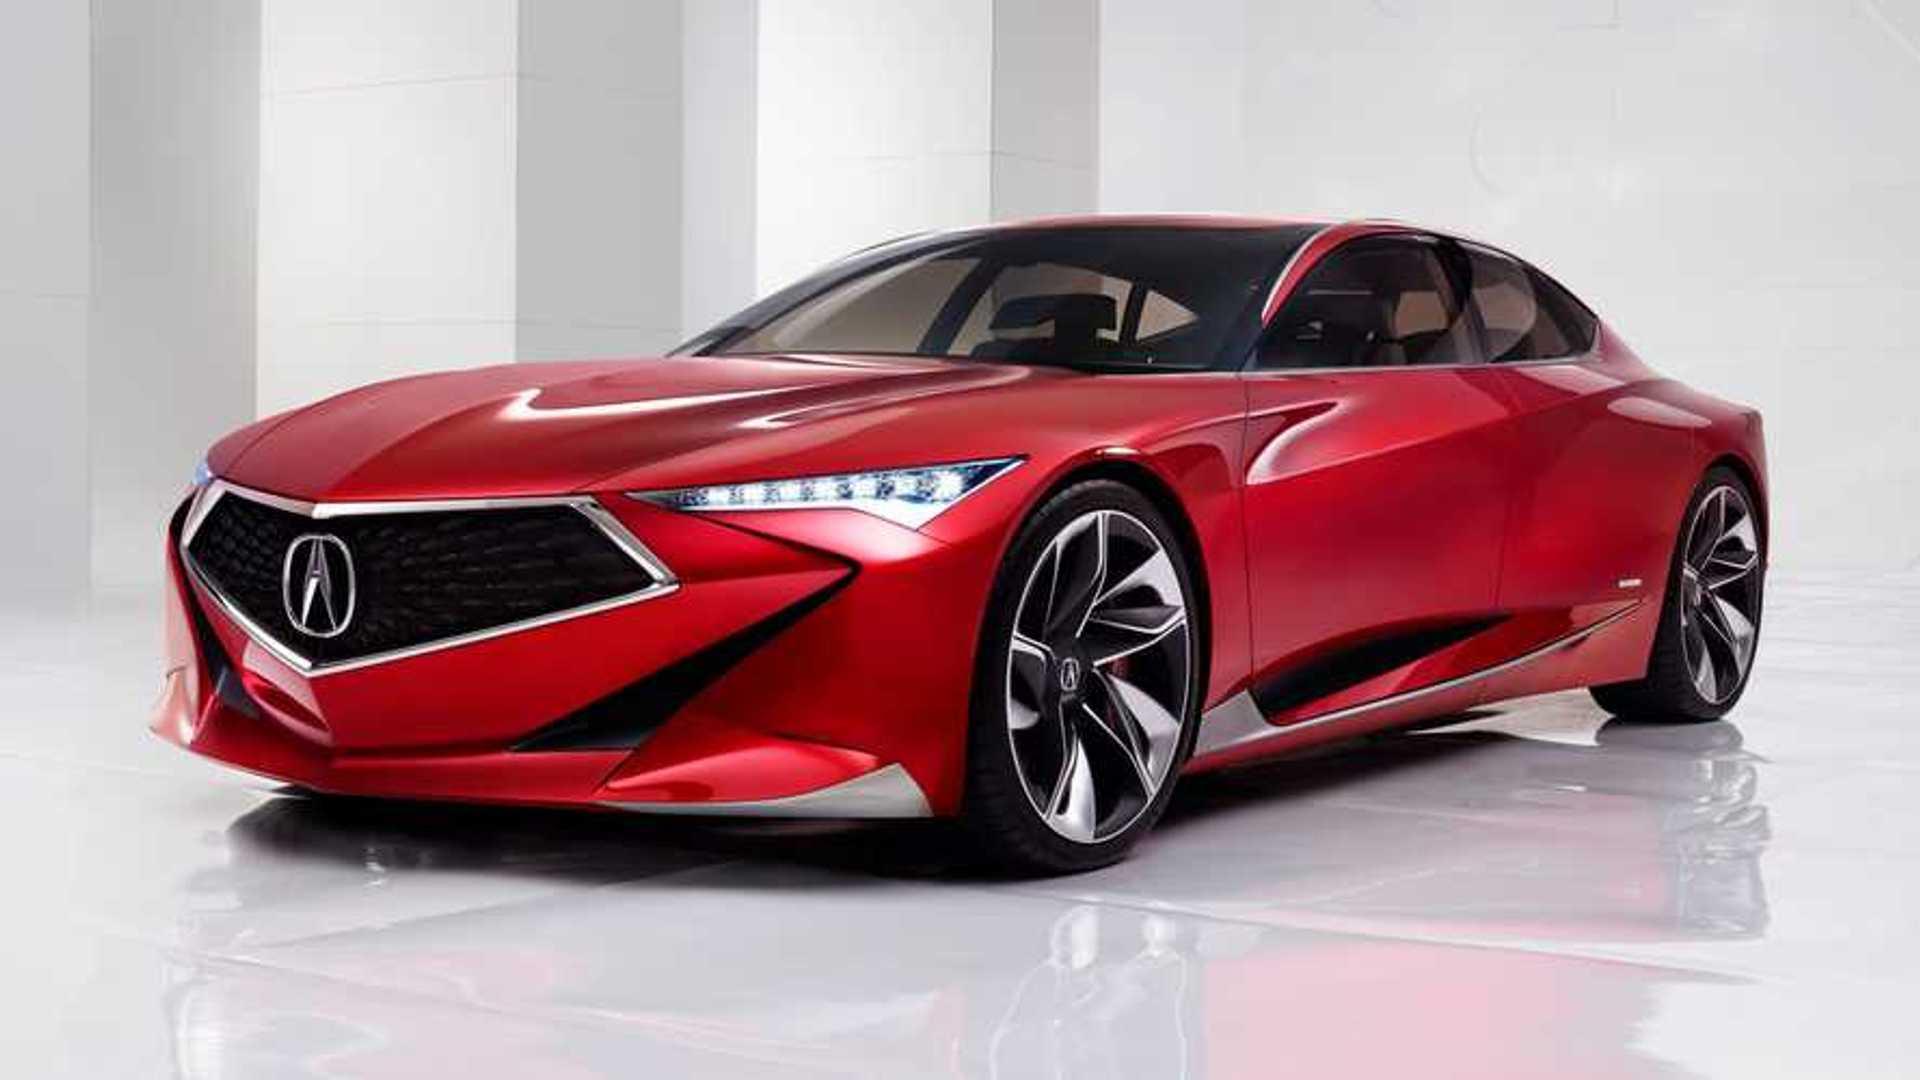 09 Acura Tl Concept Art